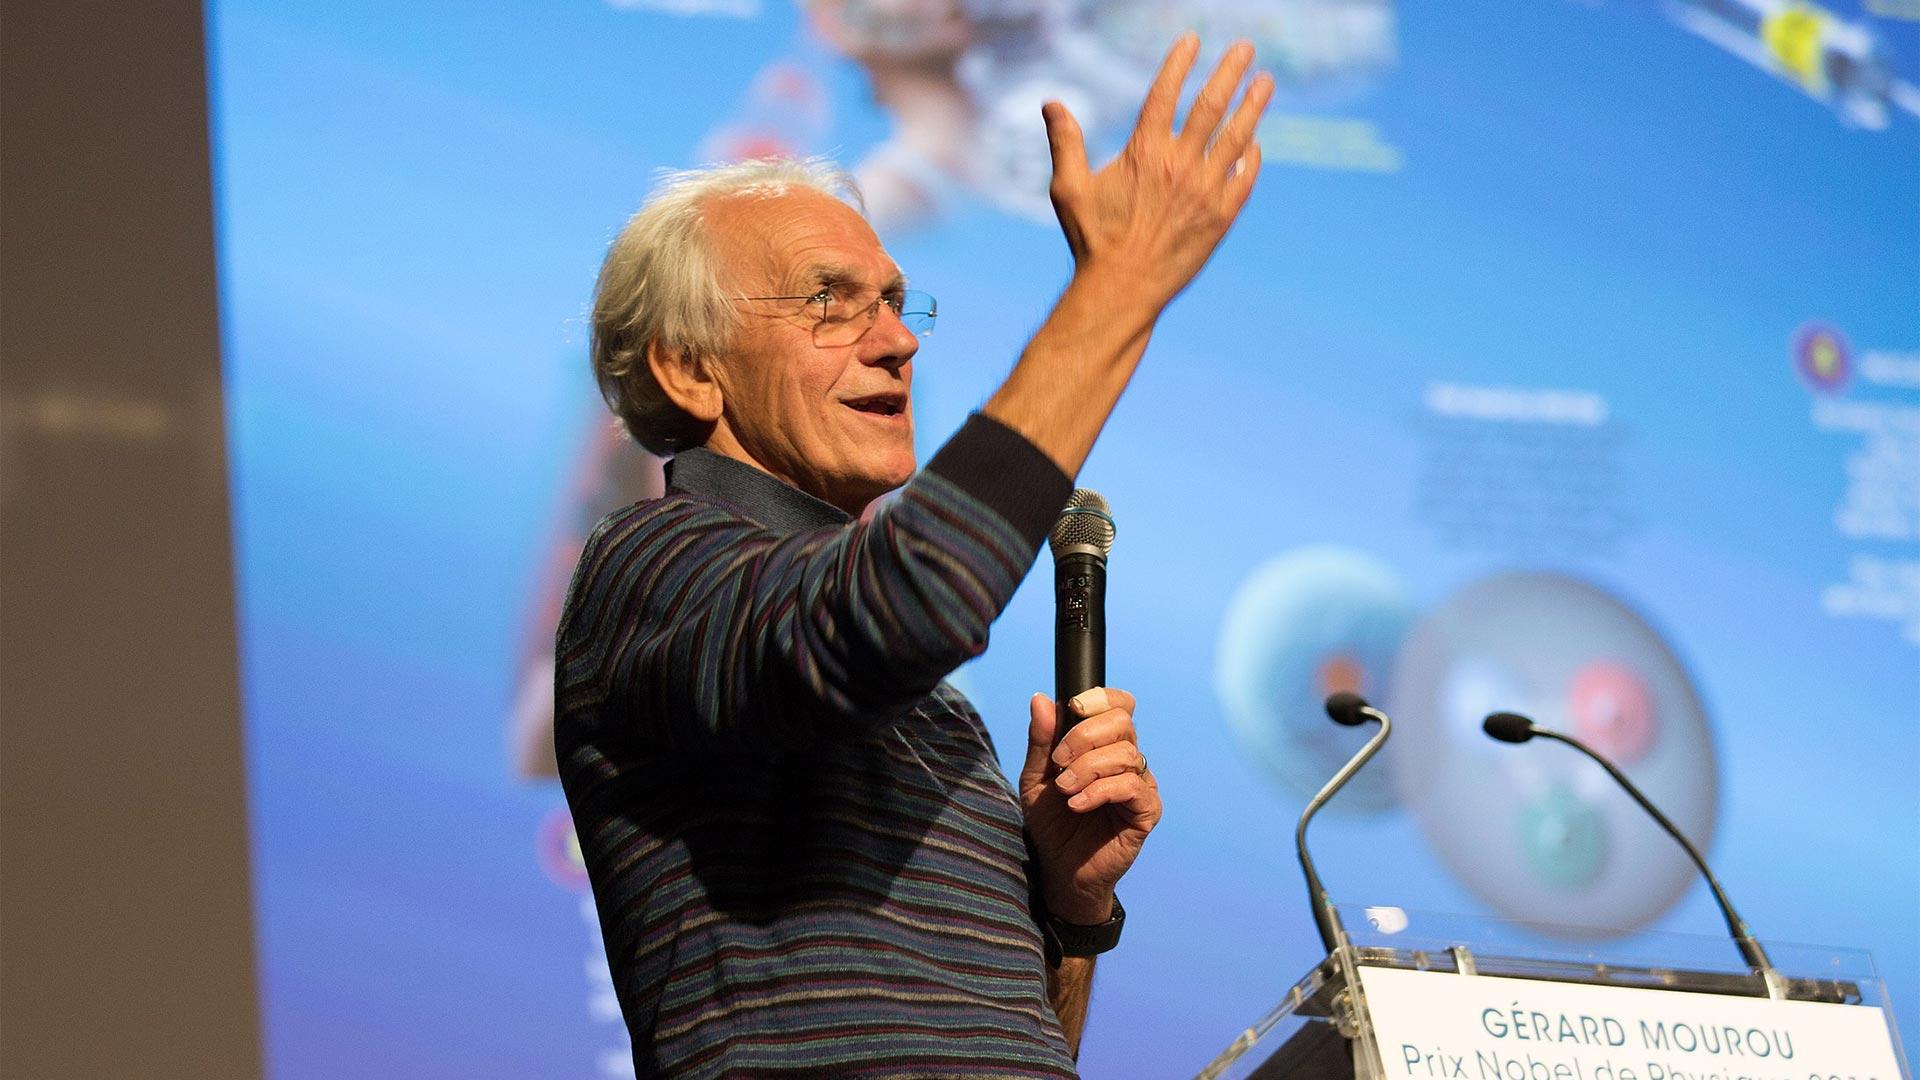 Nobel Prize winner – Gérard Mourou at the LFSL!